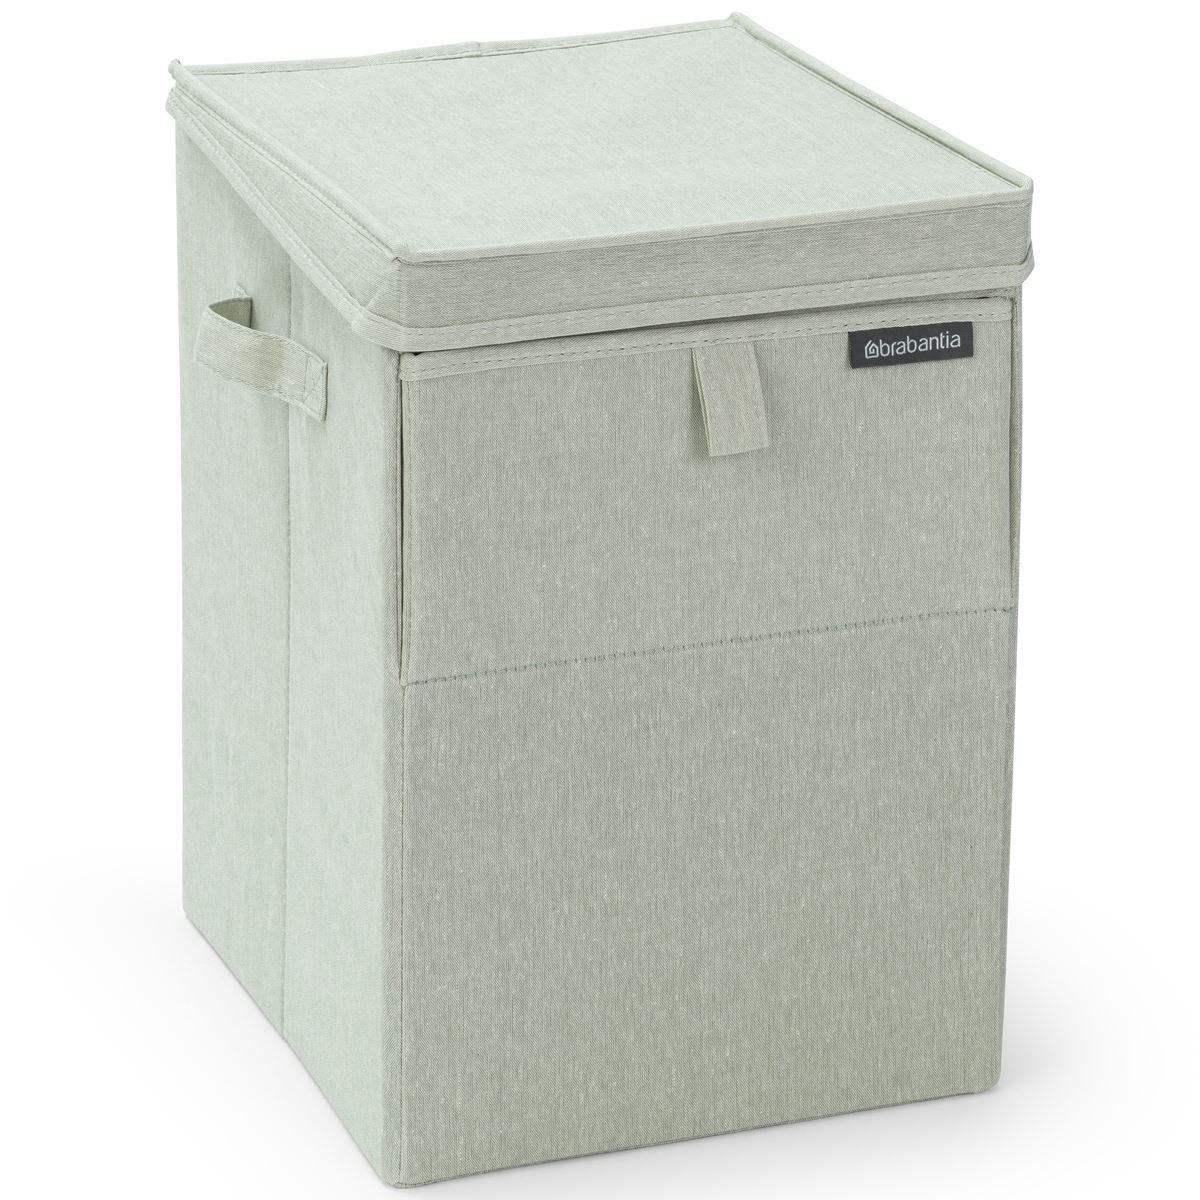 Brabantia Stackable Laundry Box Green